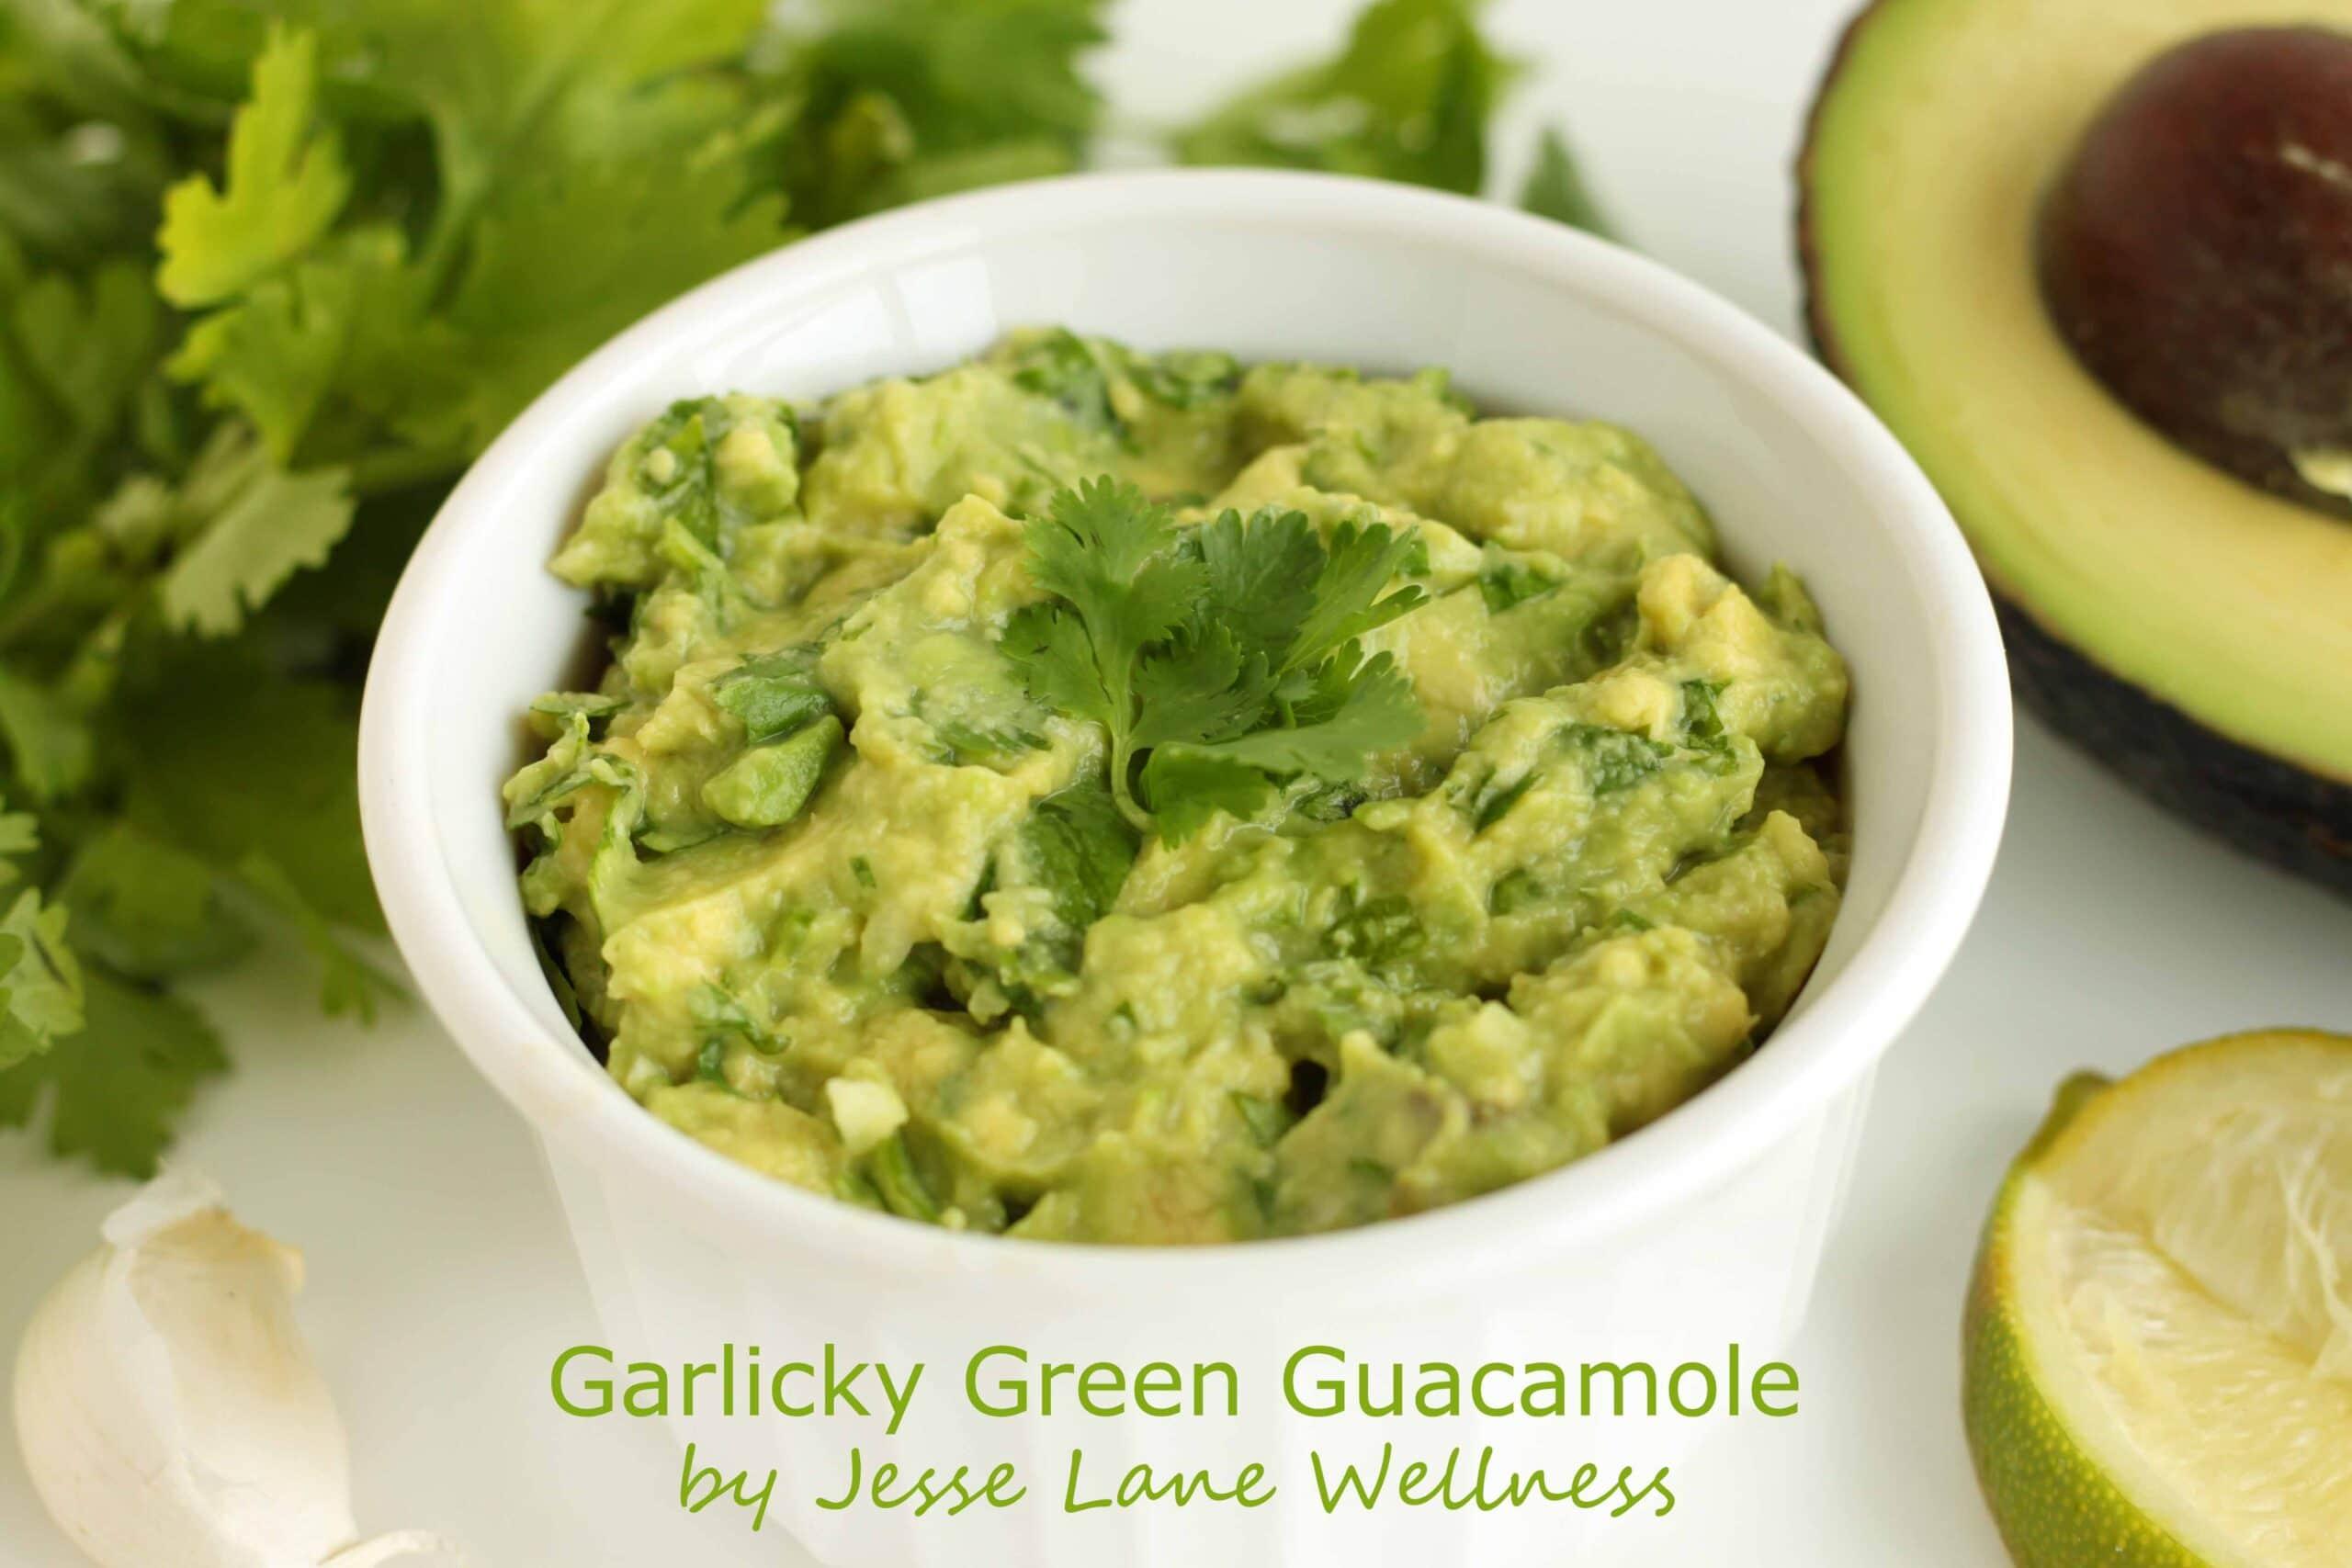 Garlicky Green Guacamole by @jesselwellness #guac #healthyeats #vegan